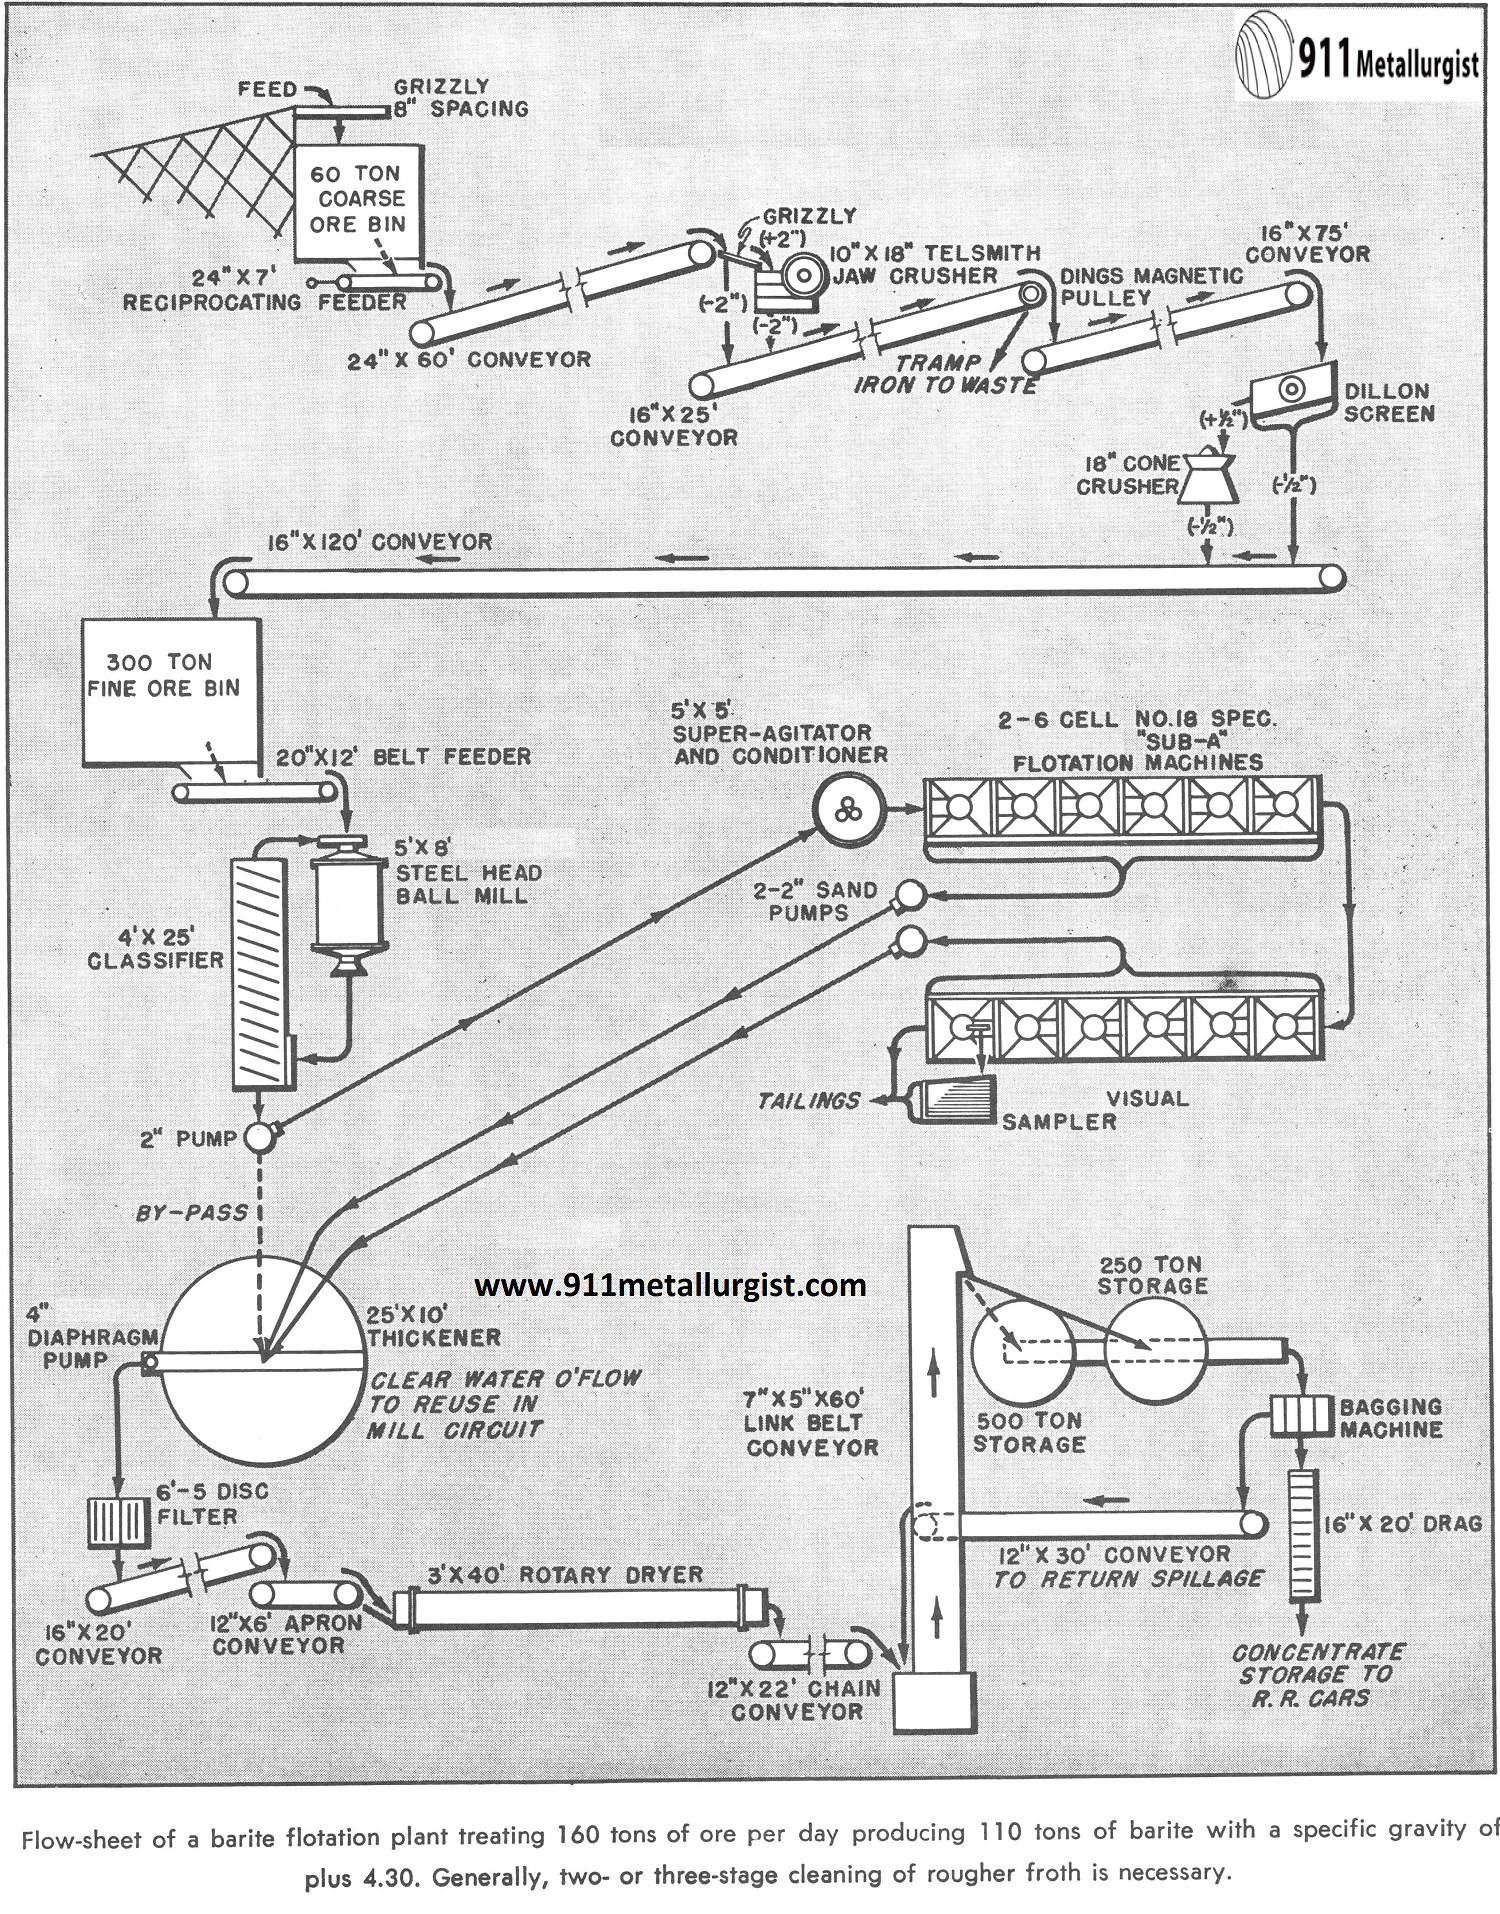 Flow-sheet of a Barite Flotation Plant